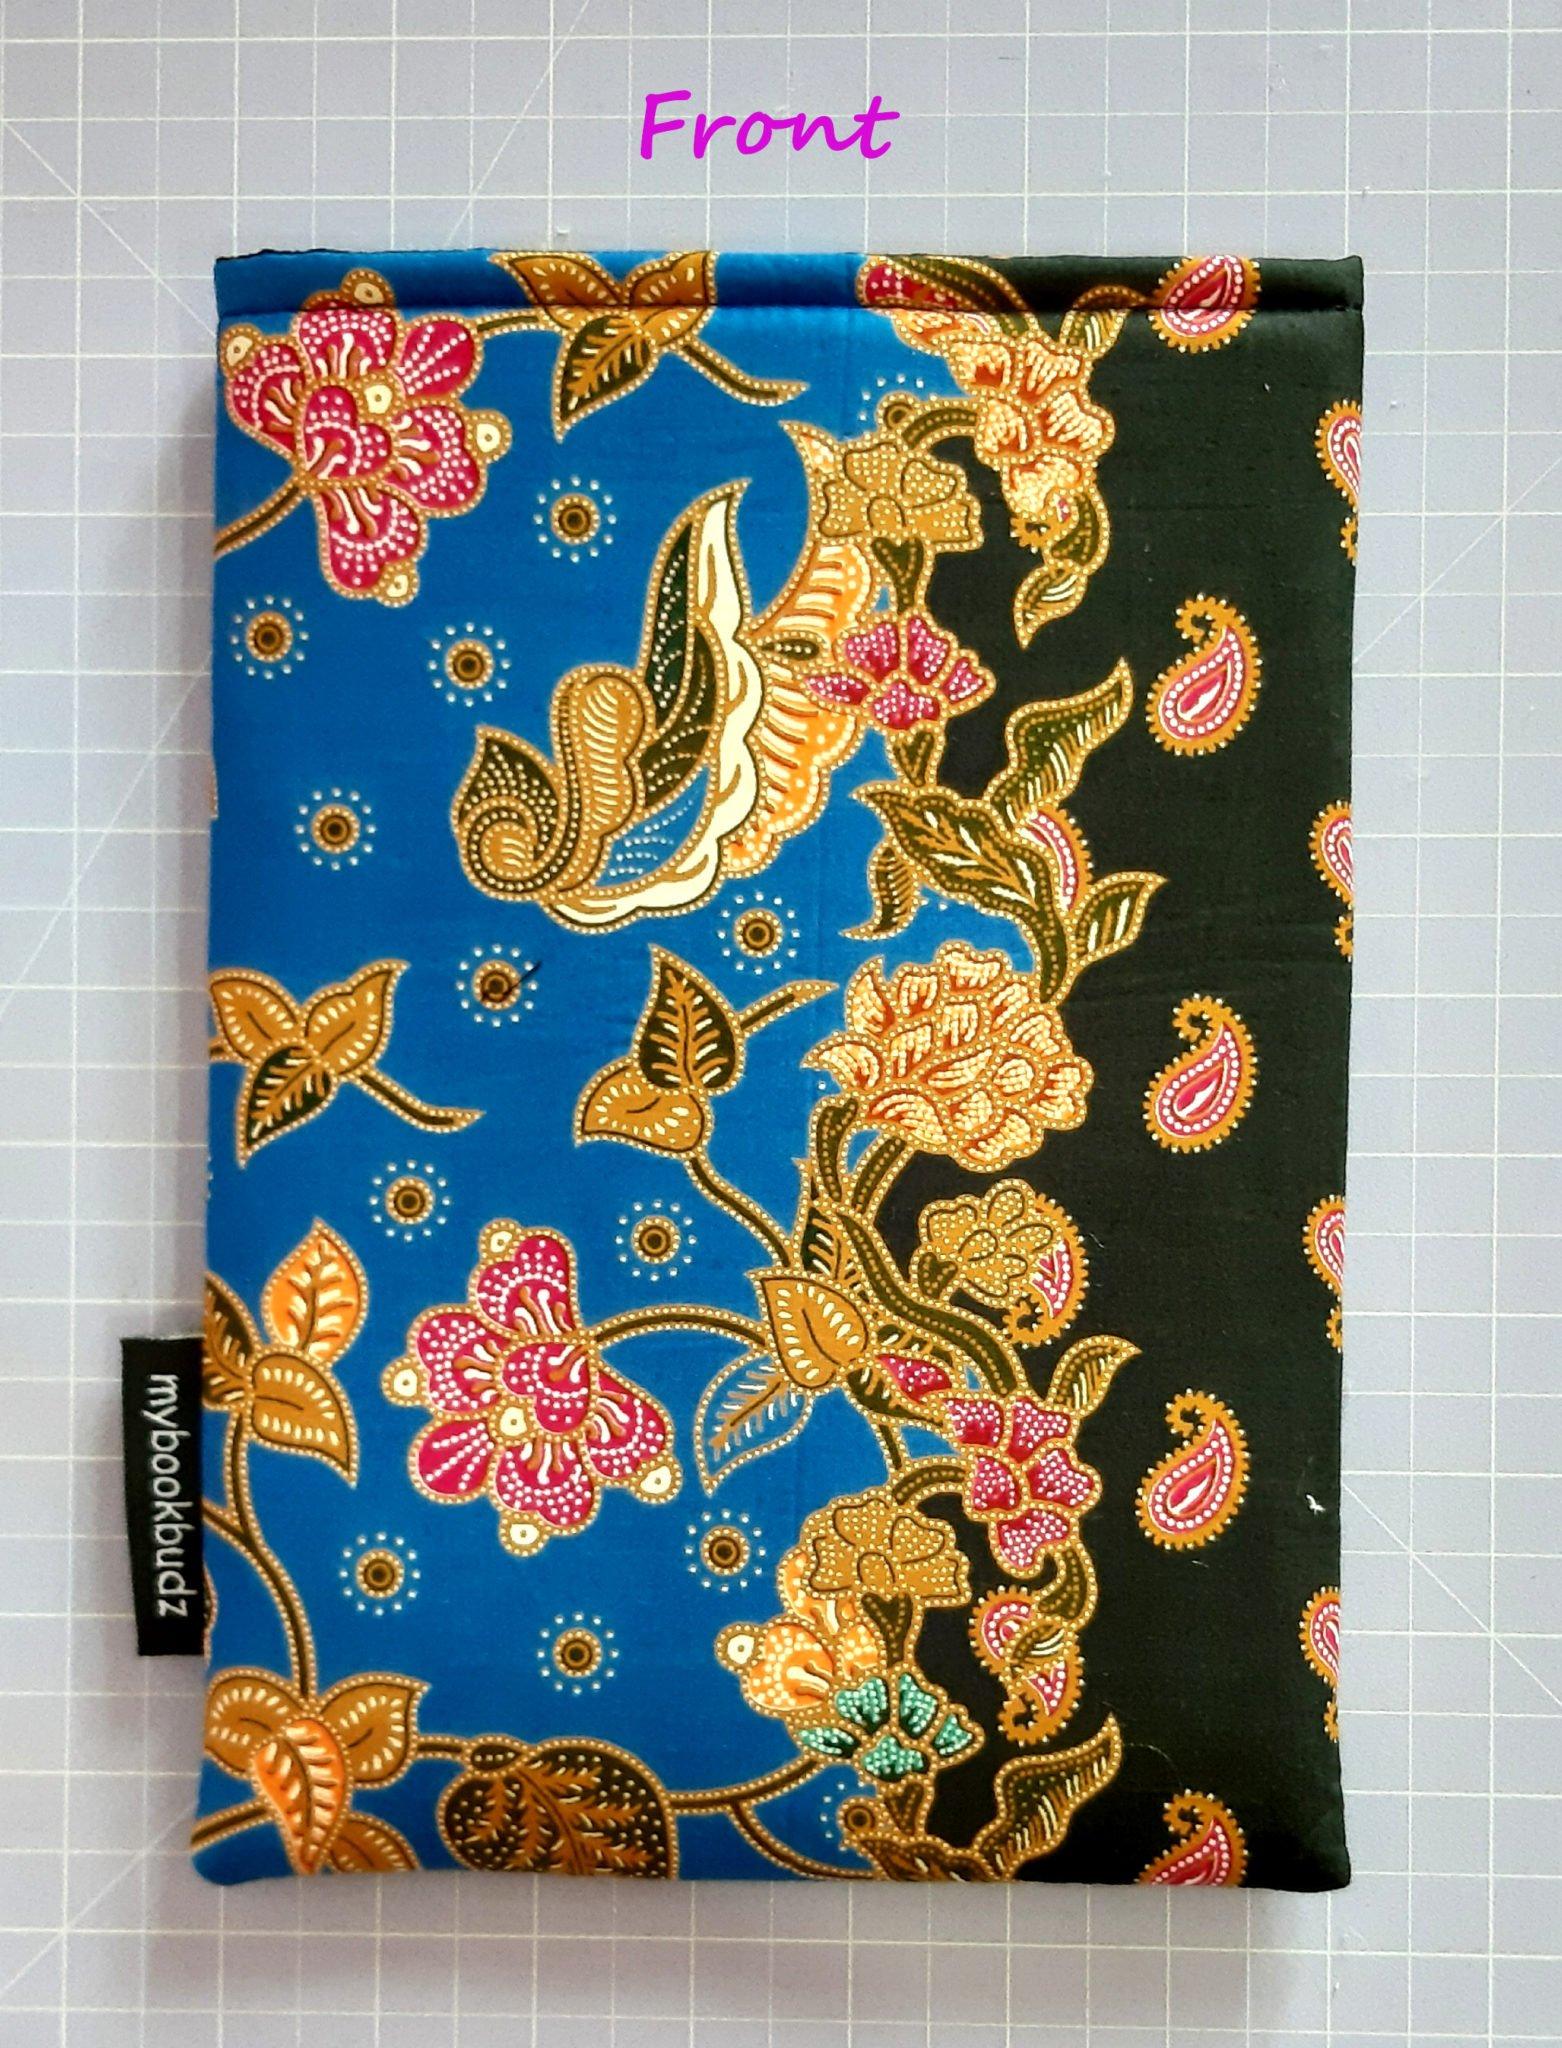 Booksleeve – Blue and Black Batik – Front